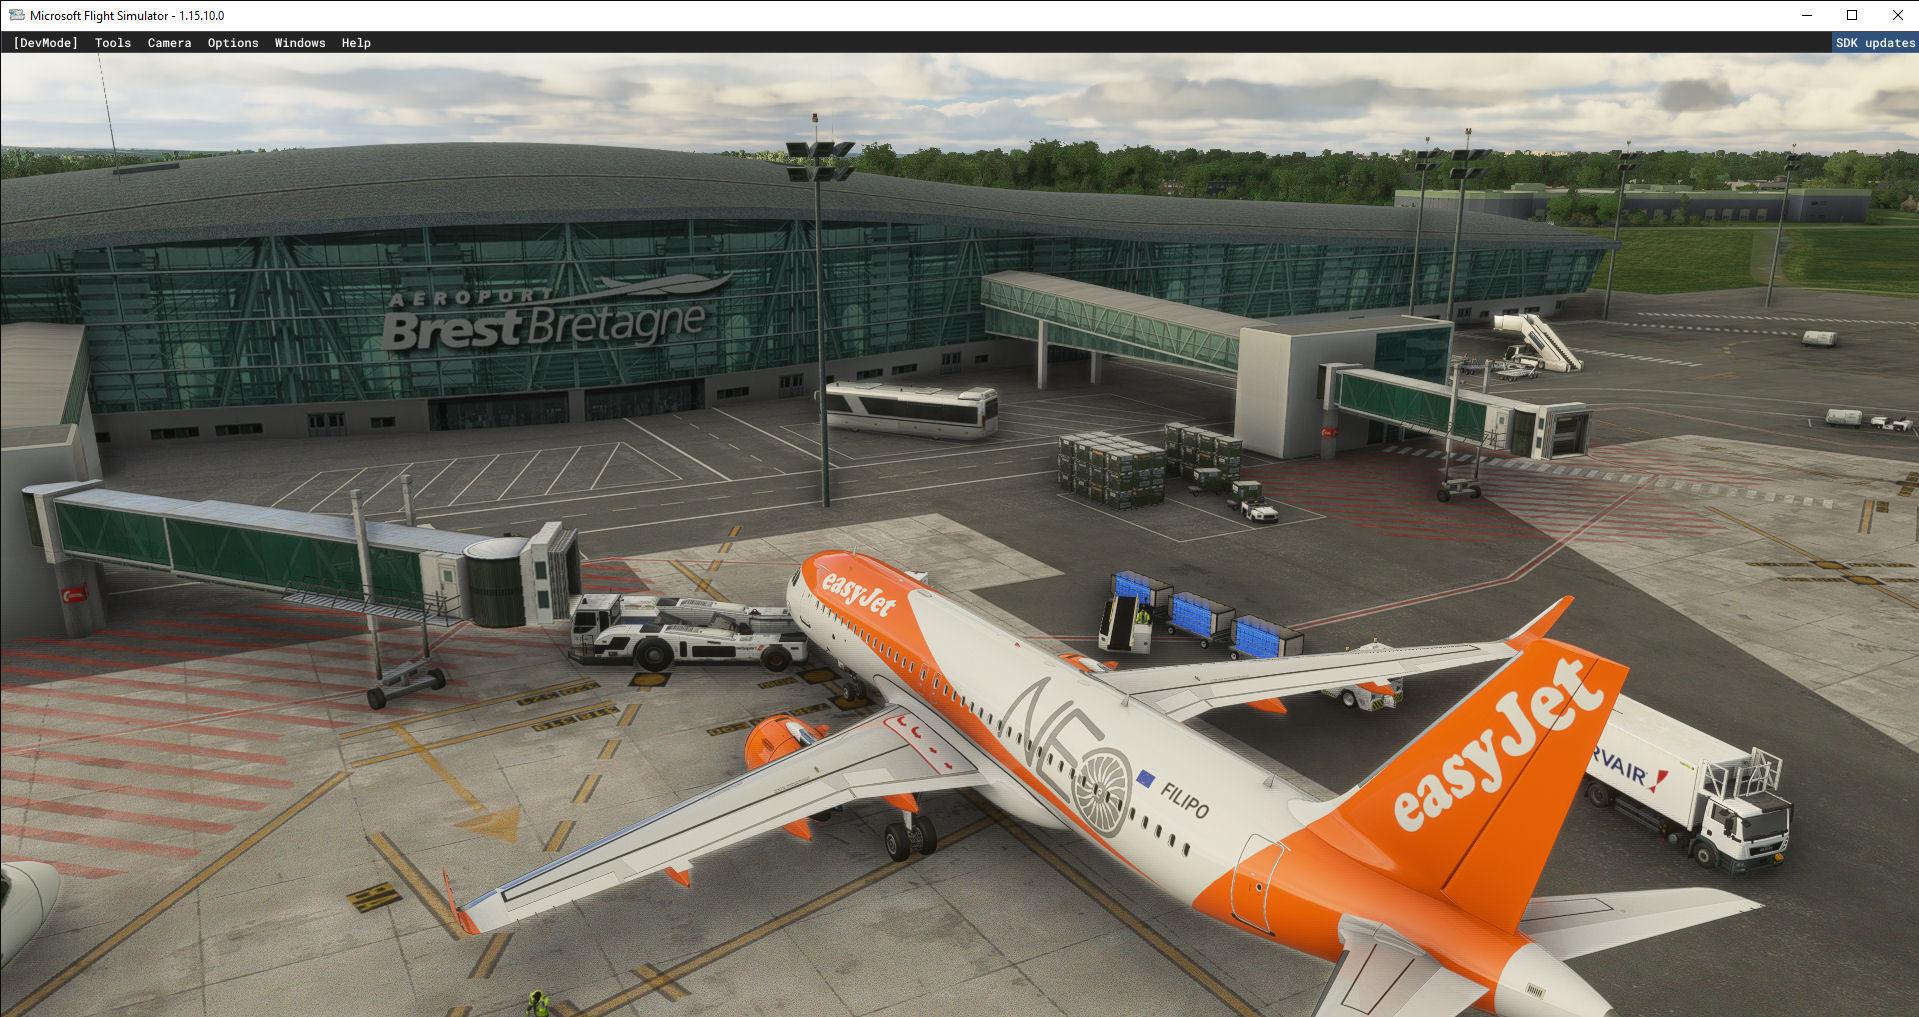 AIRPORT FRANCE Pack #1 pour MSFS disponible  Microsoft-Flight-Simulator-08-05-2021-09-32-07-Copie